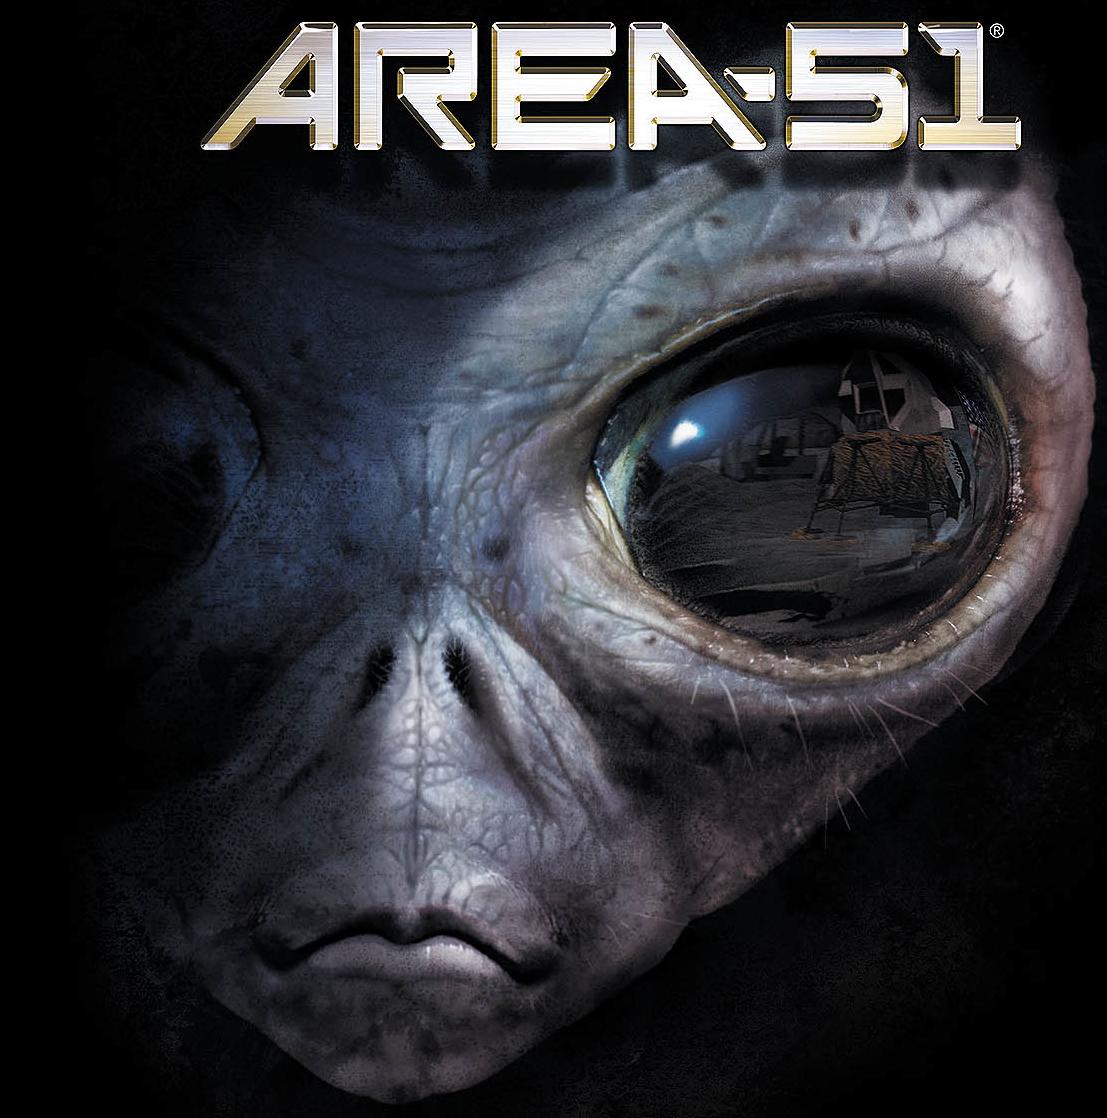 Area_51.jpg